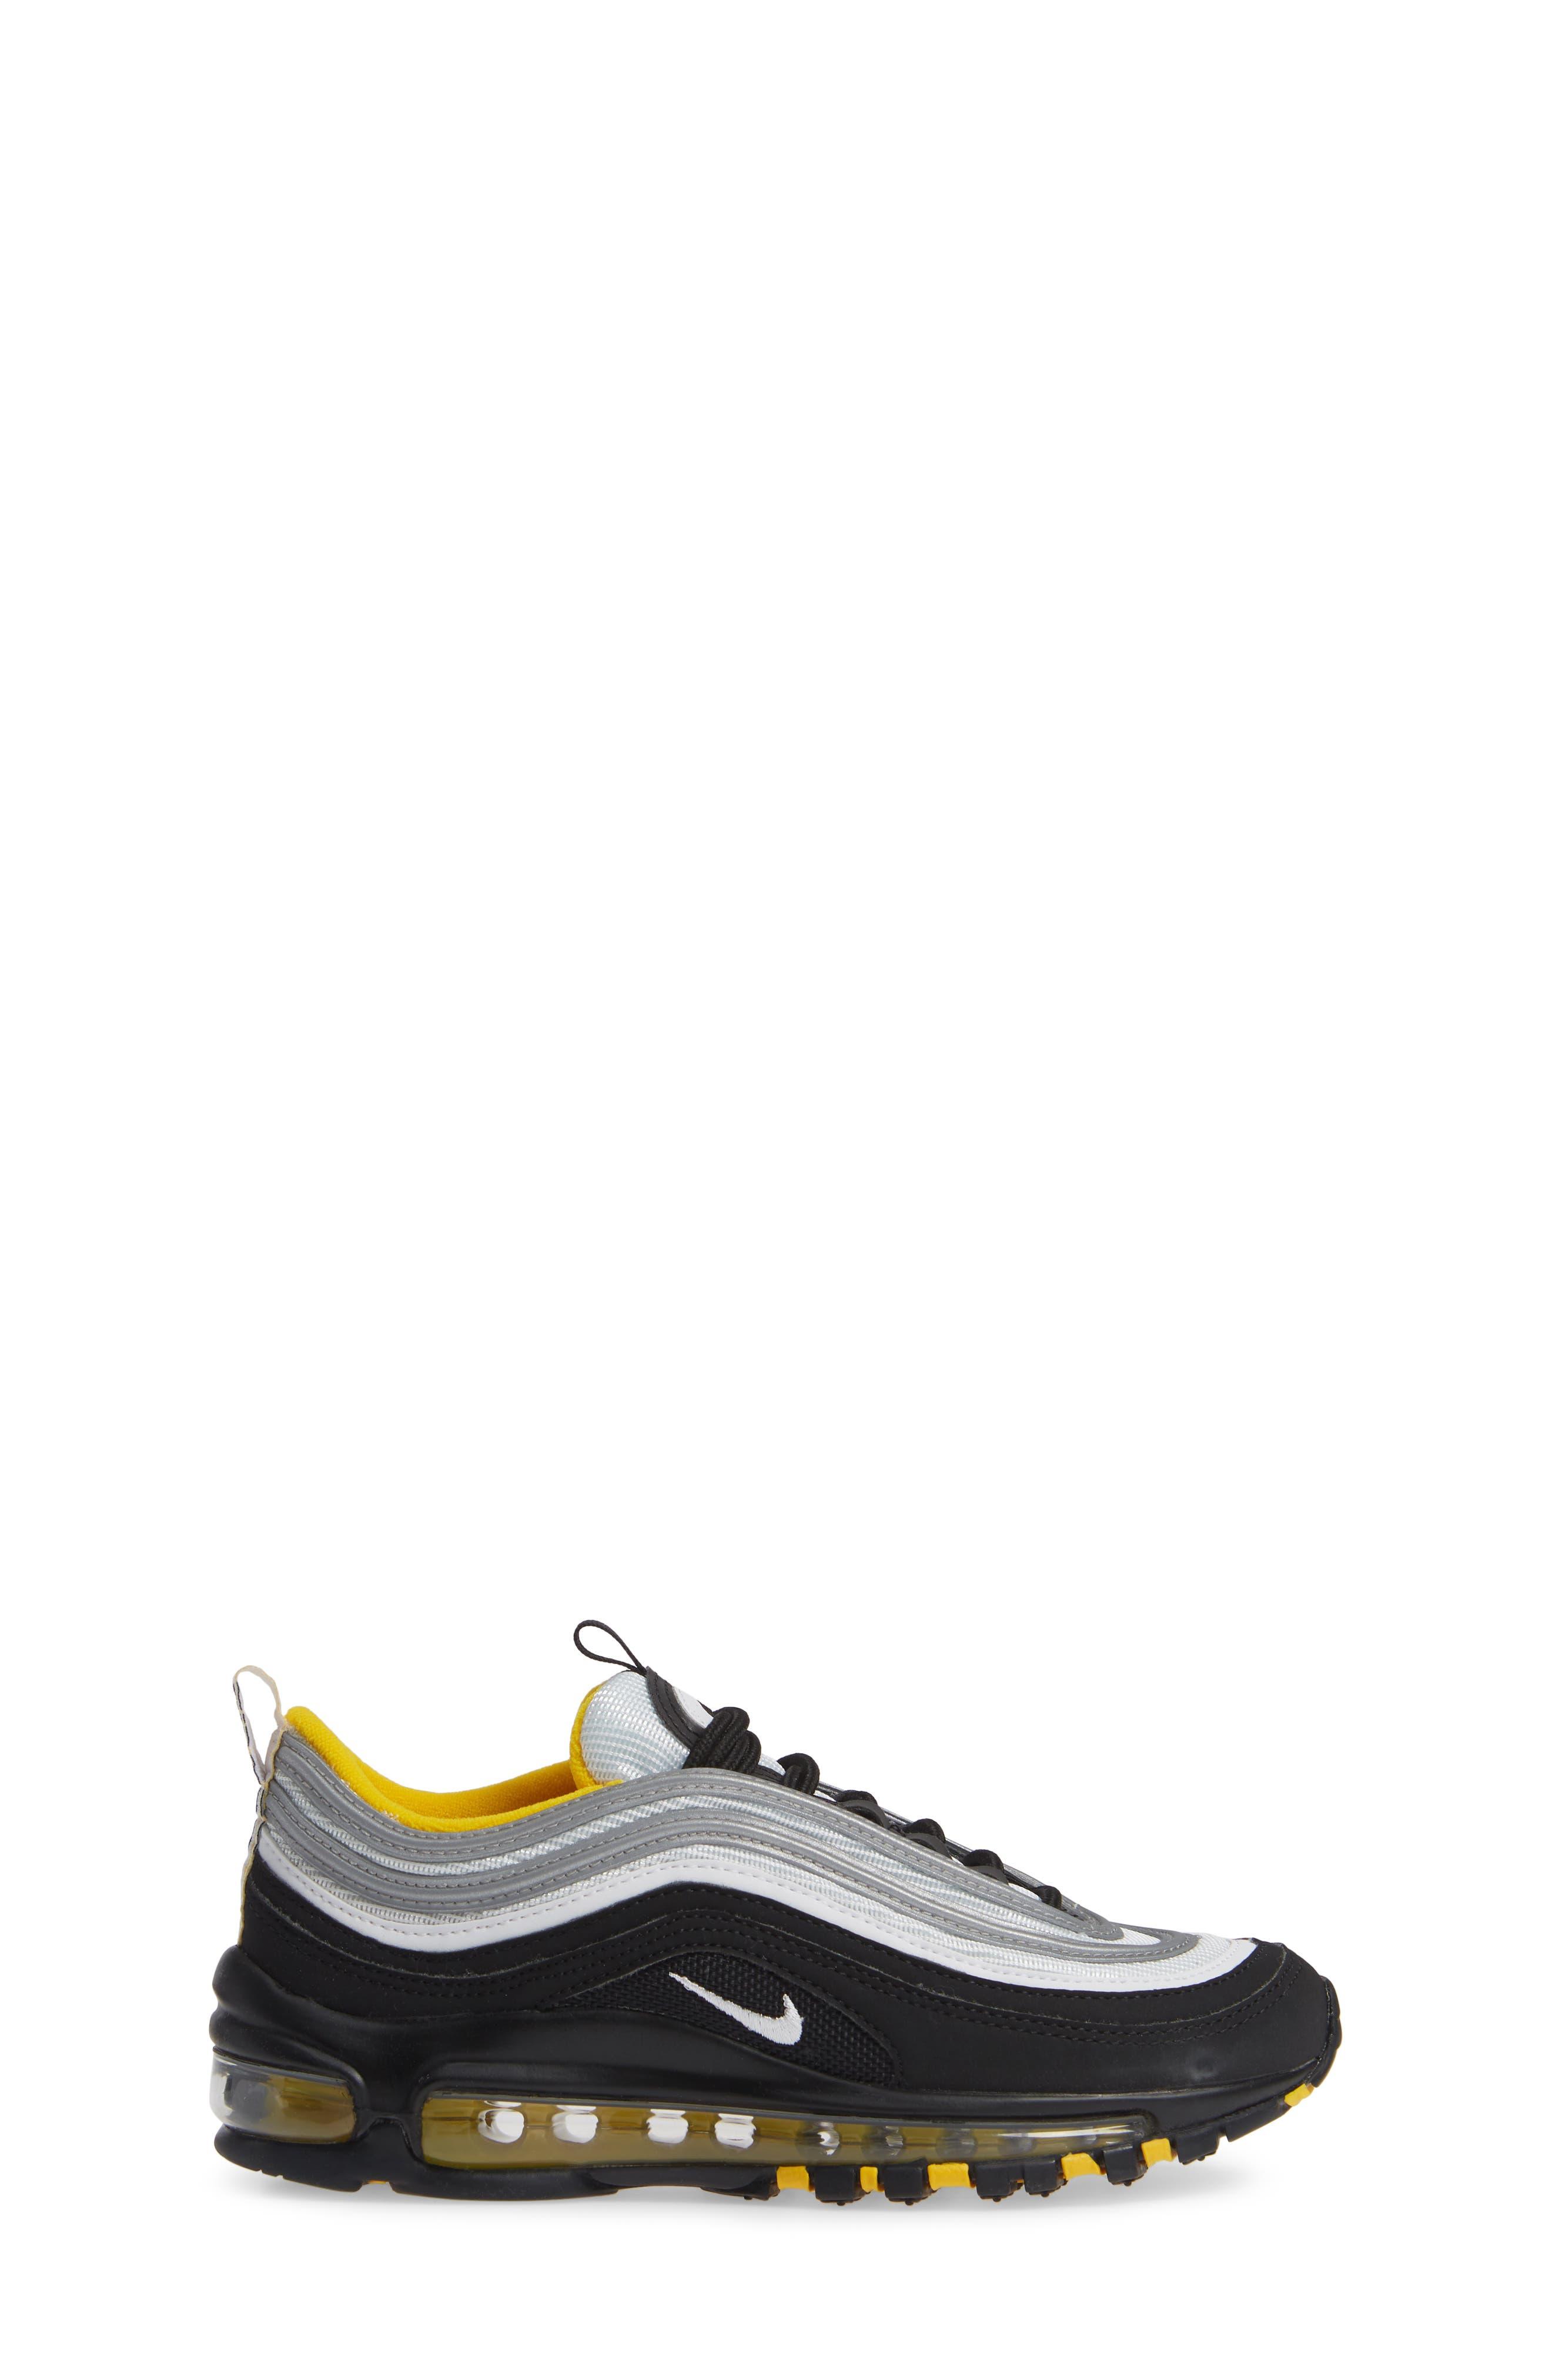 Air Max 97 Sneaker,                             Alternate thumbnail 3, color,                             BLACK/ WHITE/ AMARILLO